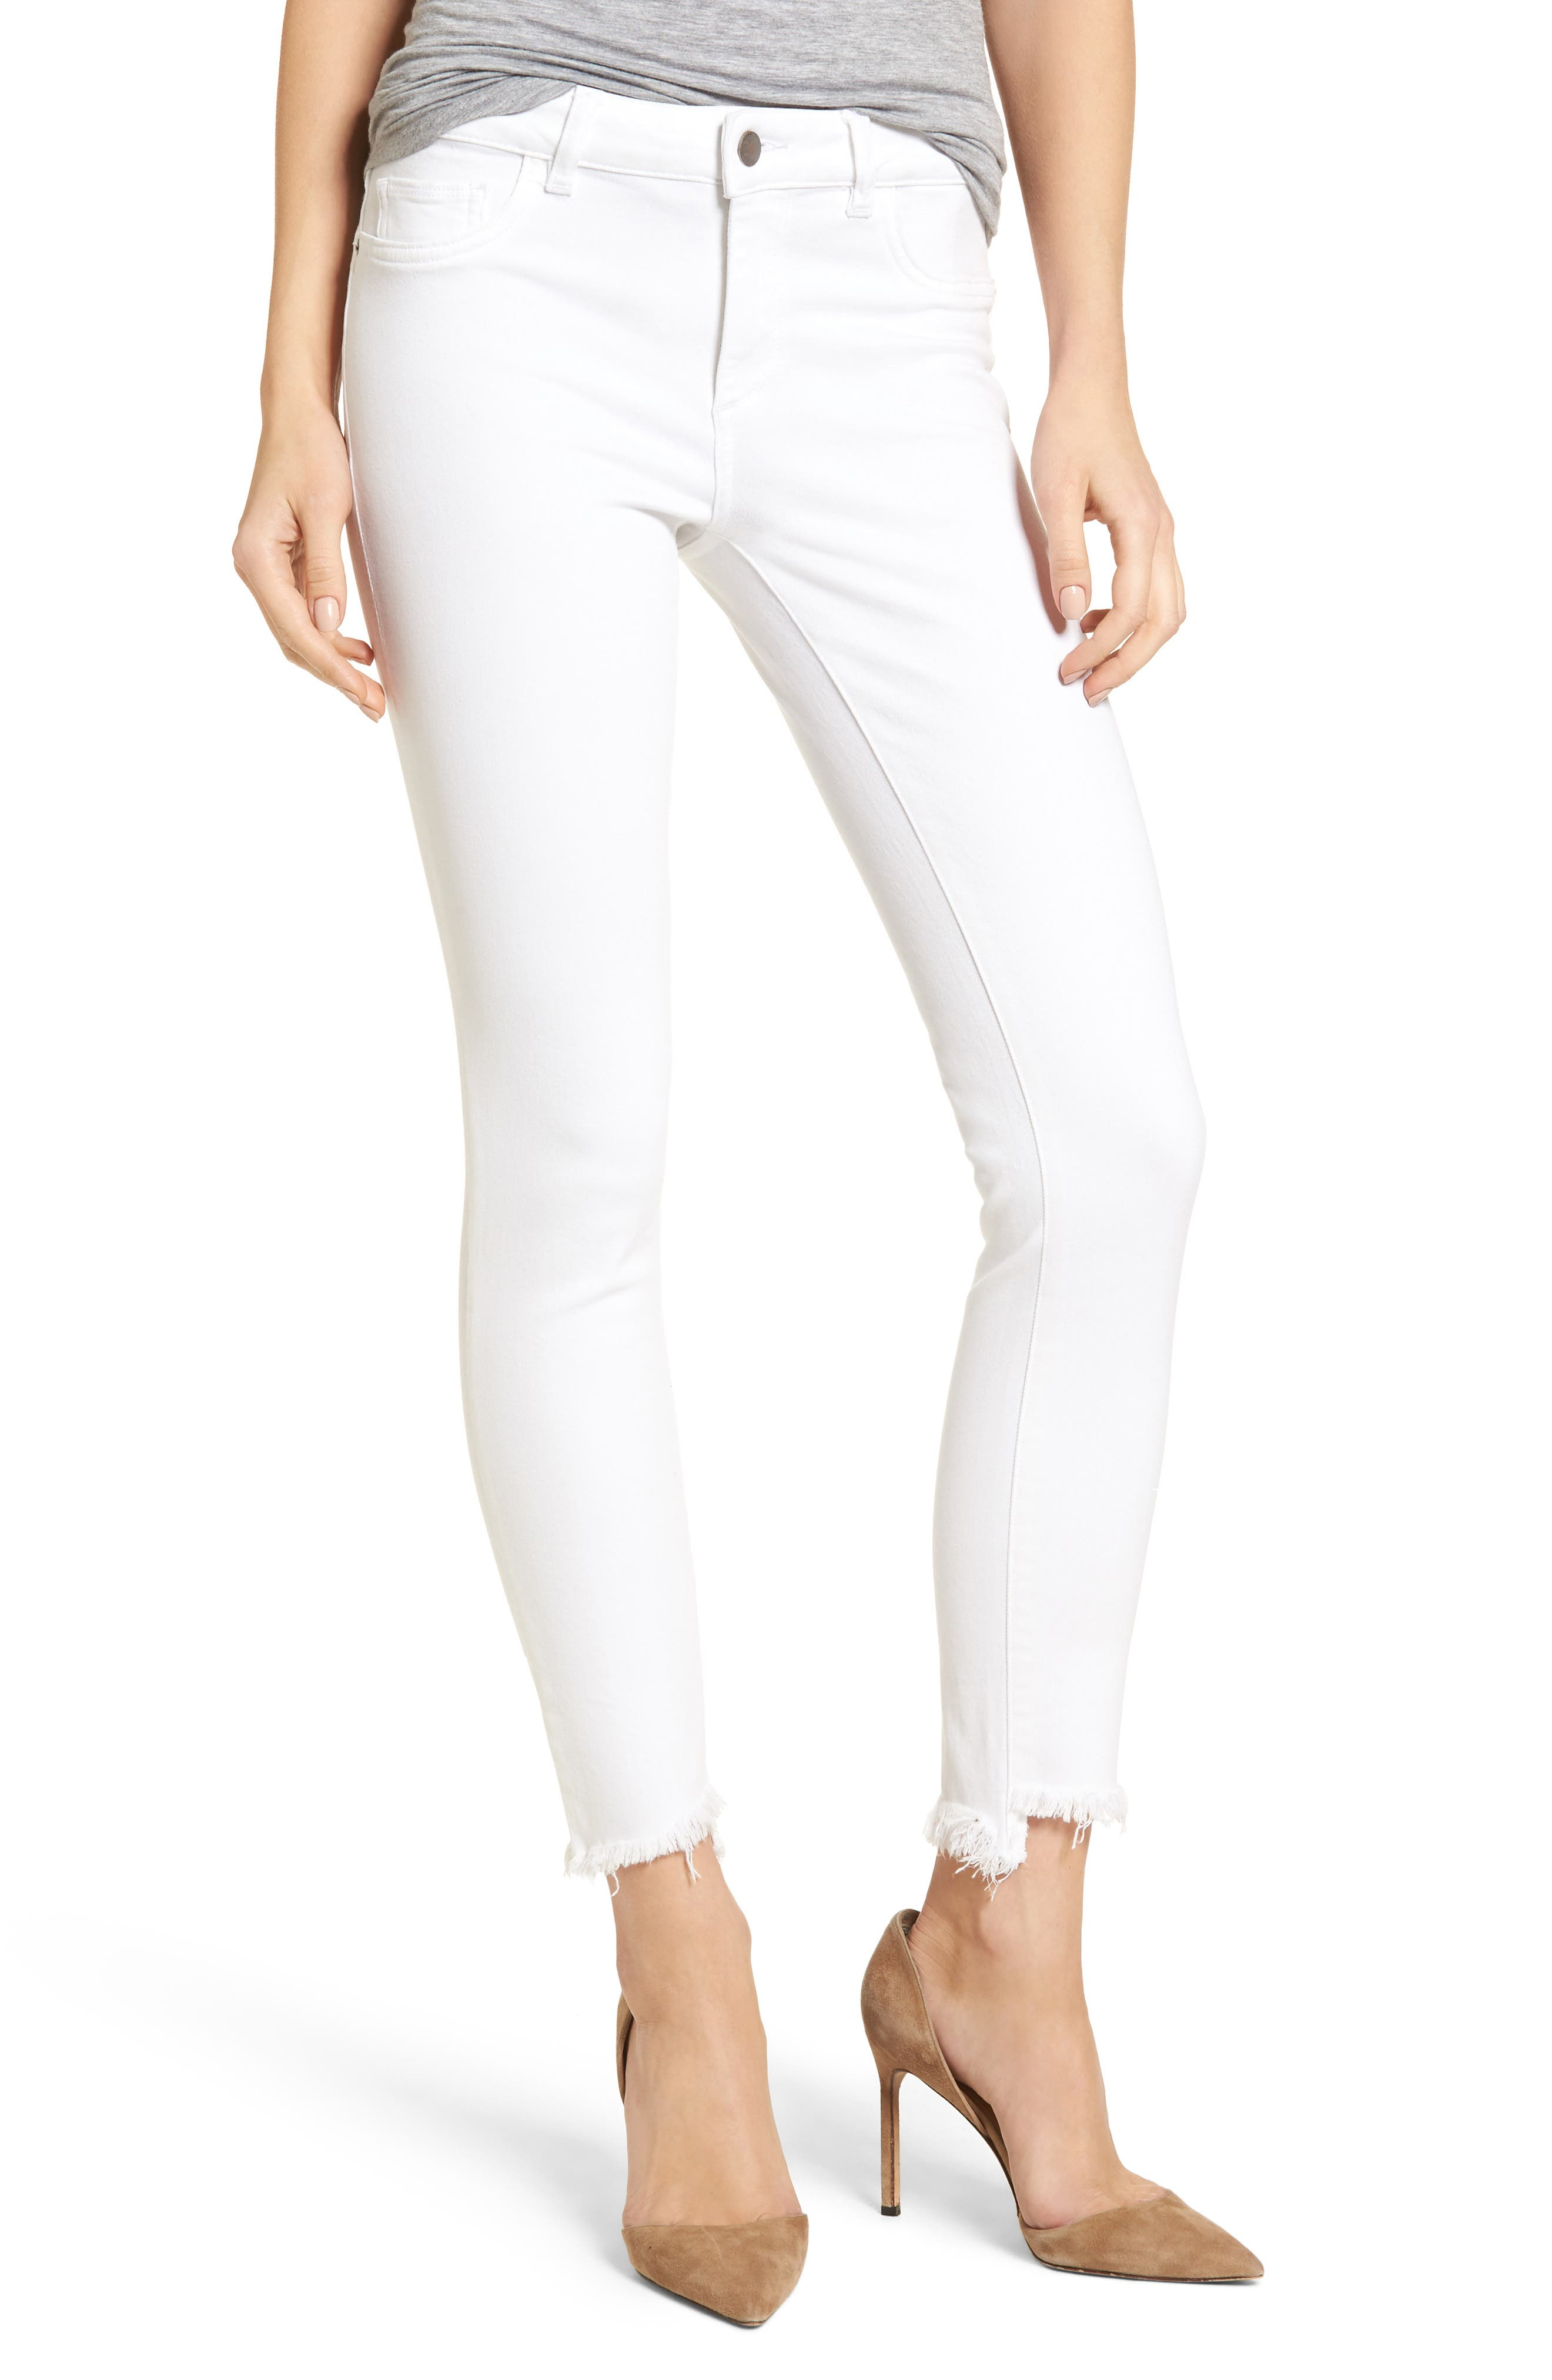 Alternate Image 1 Selected - DL1961 Margaux Instasculpt Ankle Skinny Jeans (Catalina)